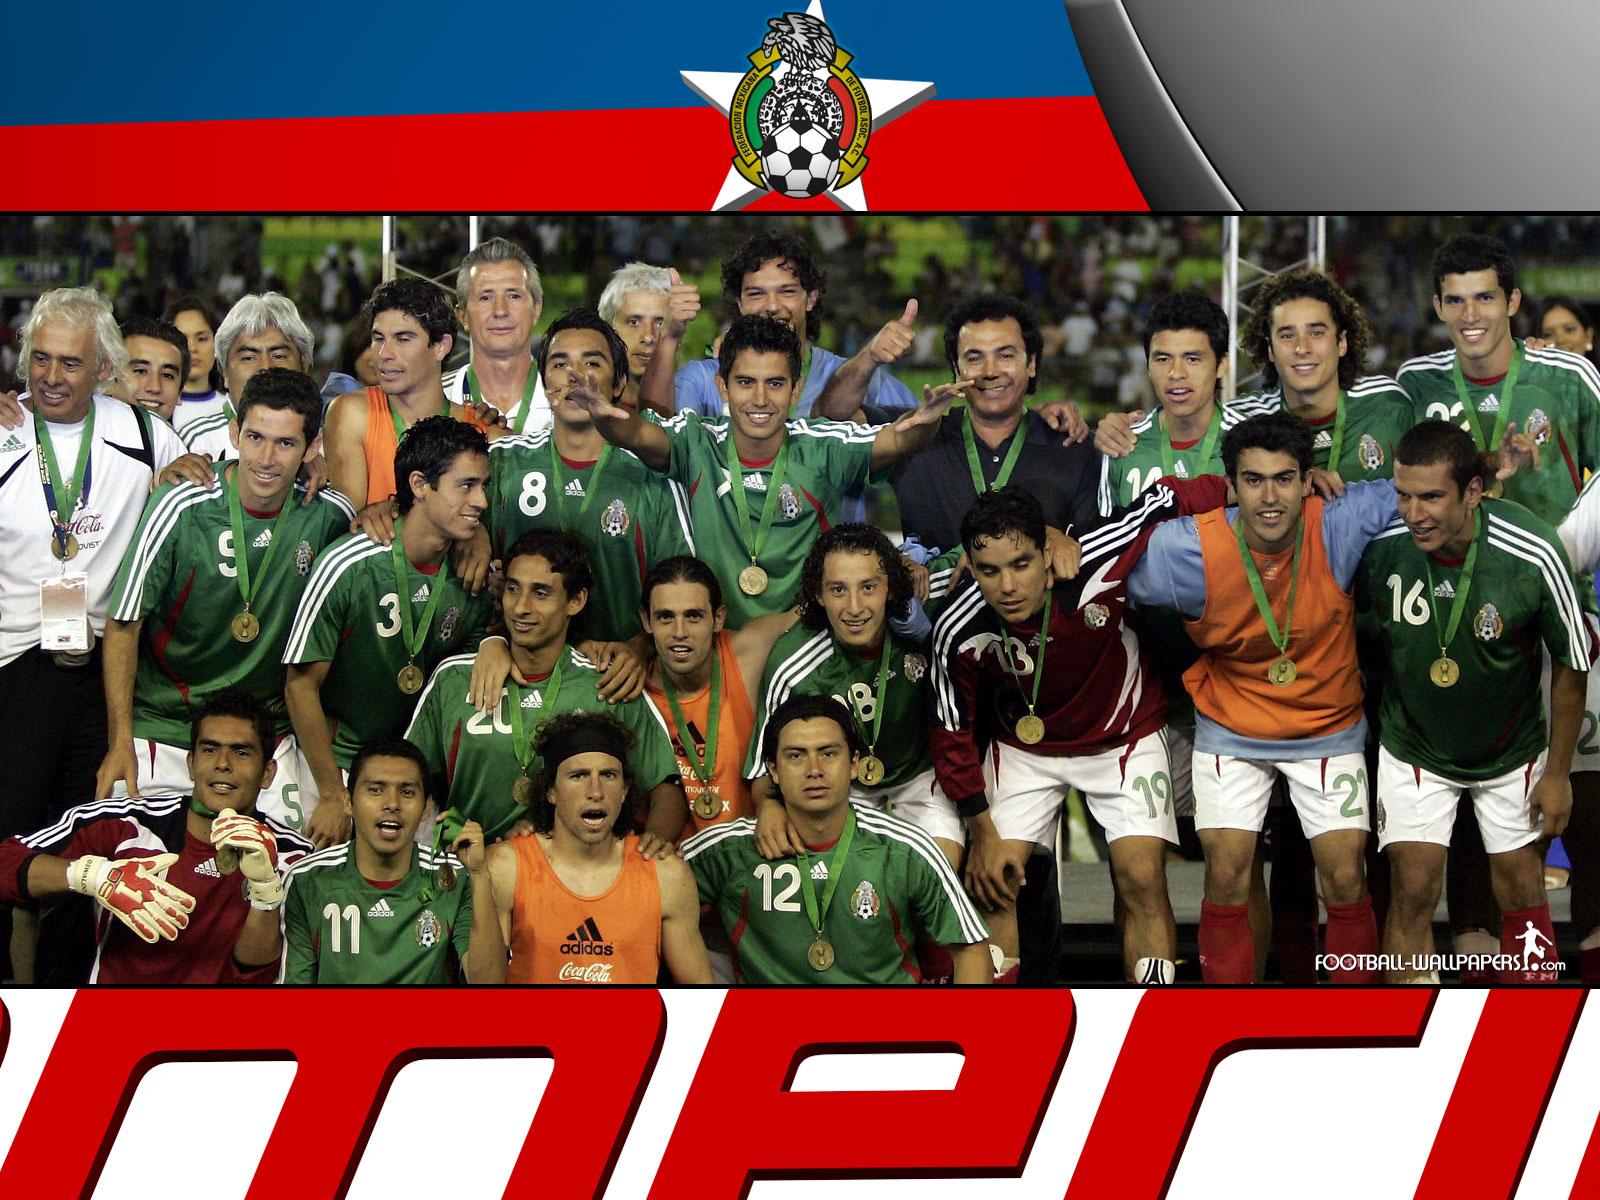 Soccer Team Wallpapers